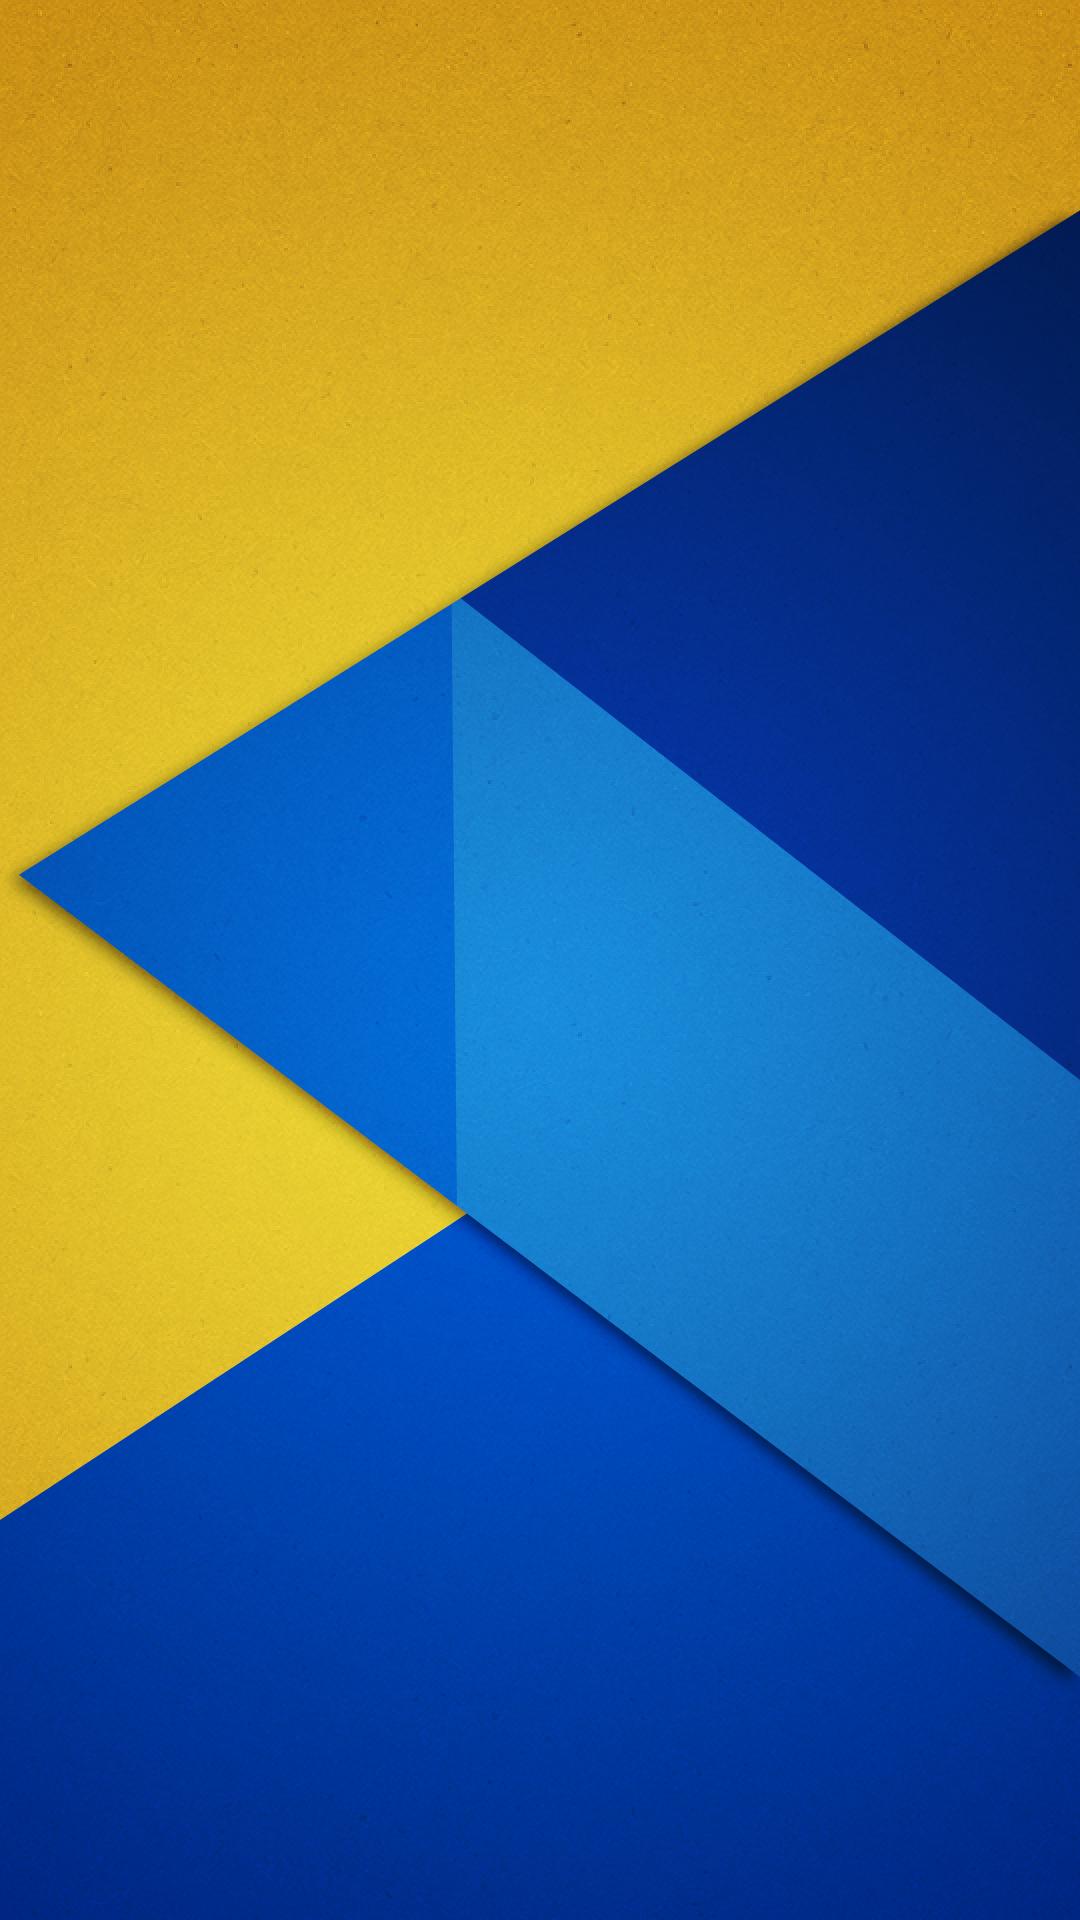 Android 6.0 Marshmallow Wallpapers - WallpaperSafari